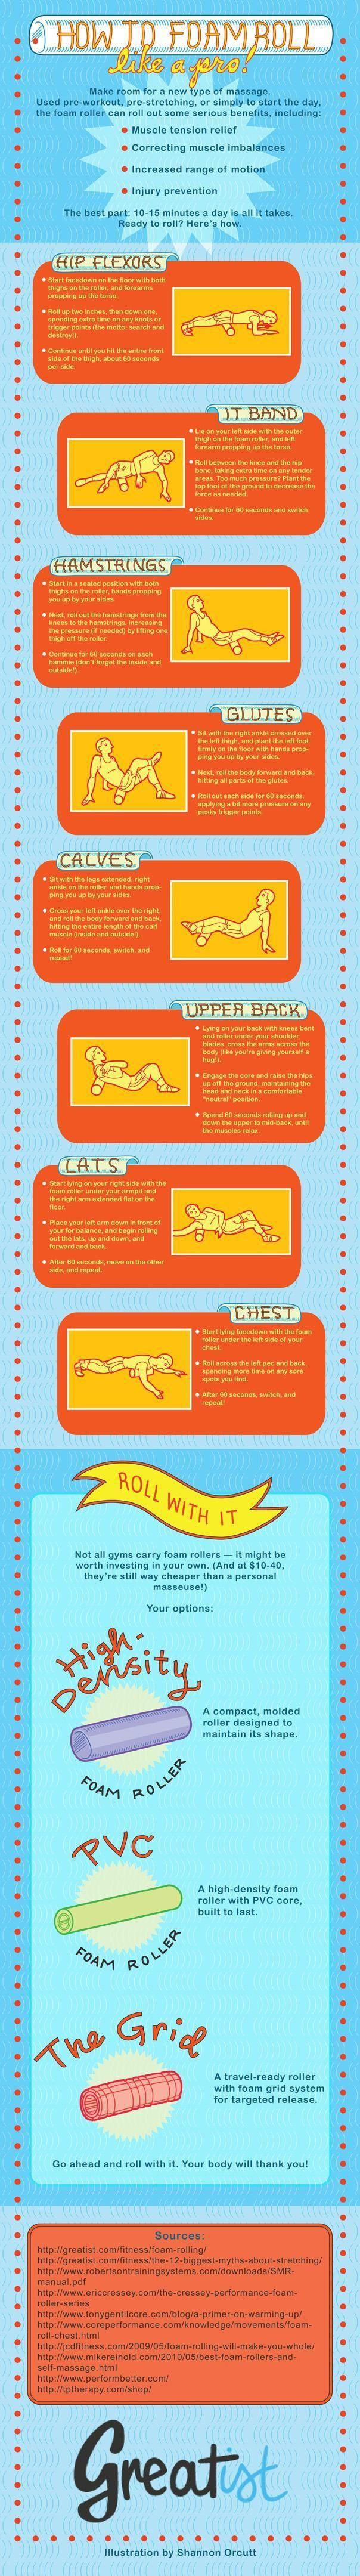 Sciatica Treatment: How to Foam Roll Like a Pro